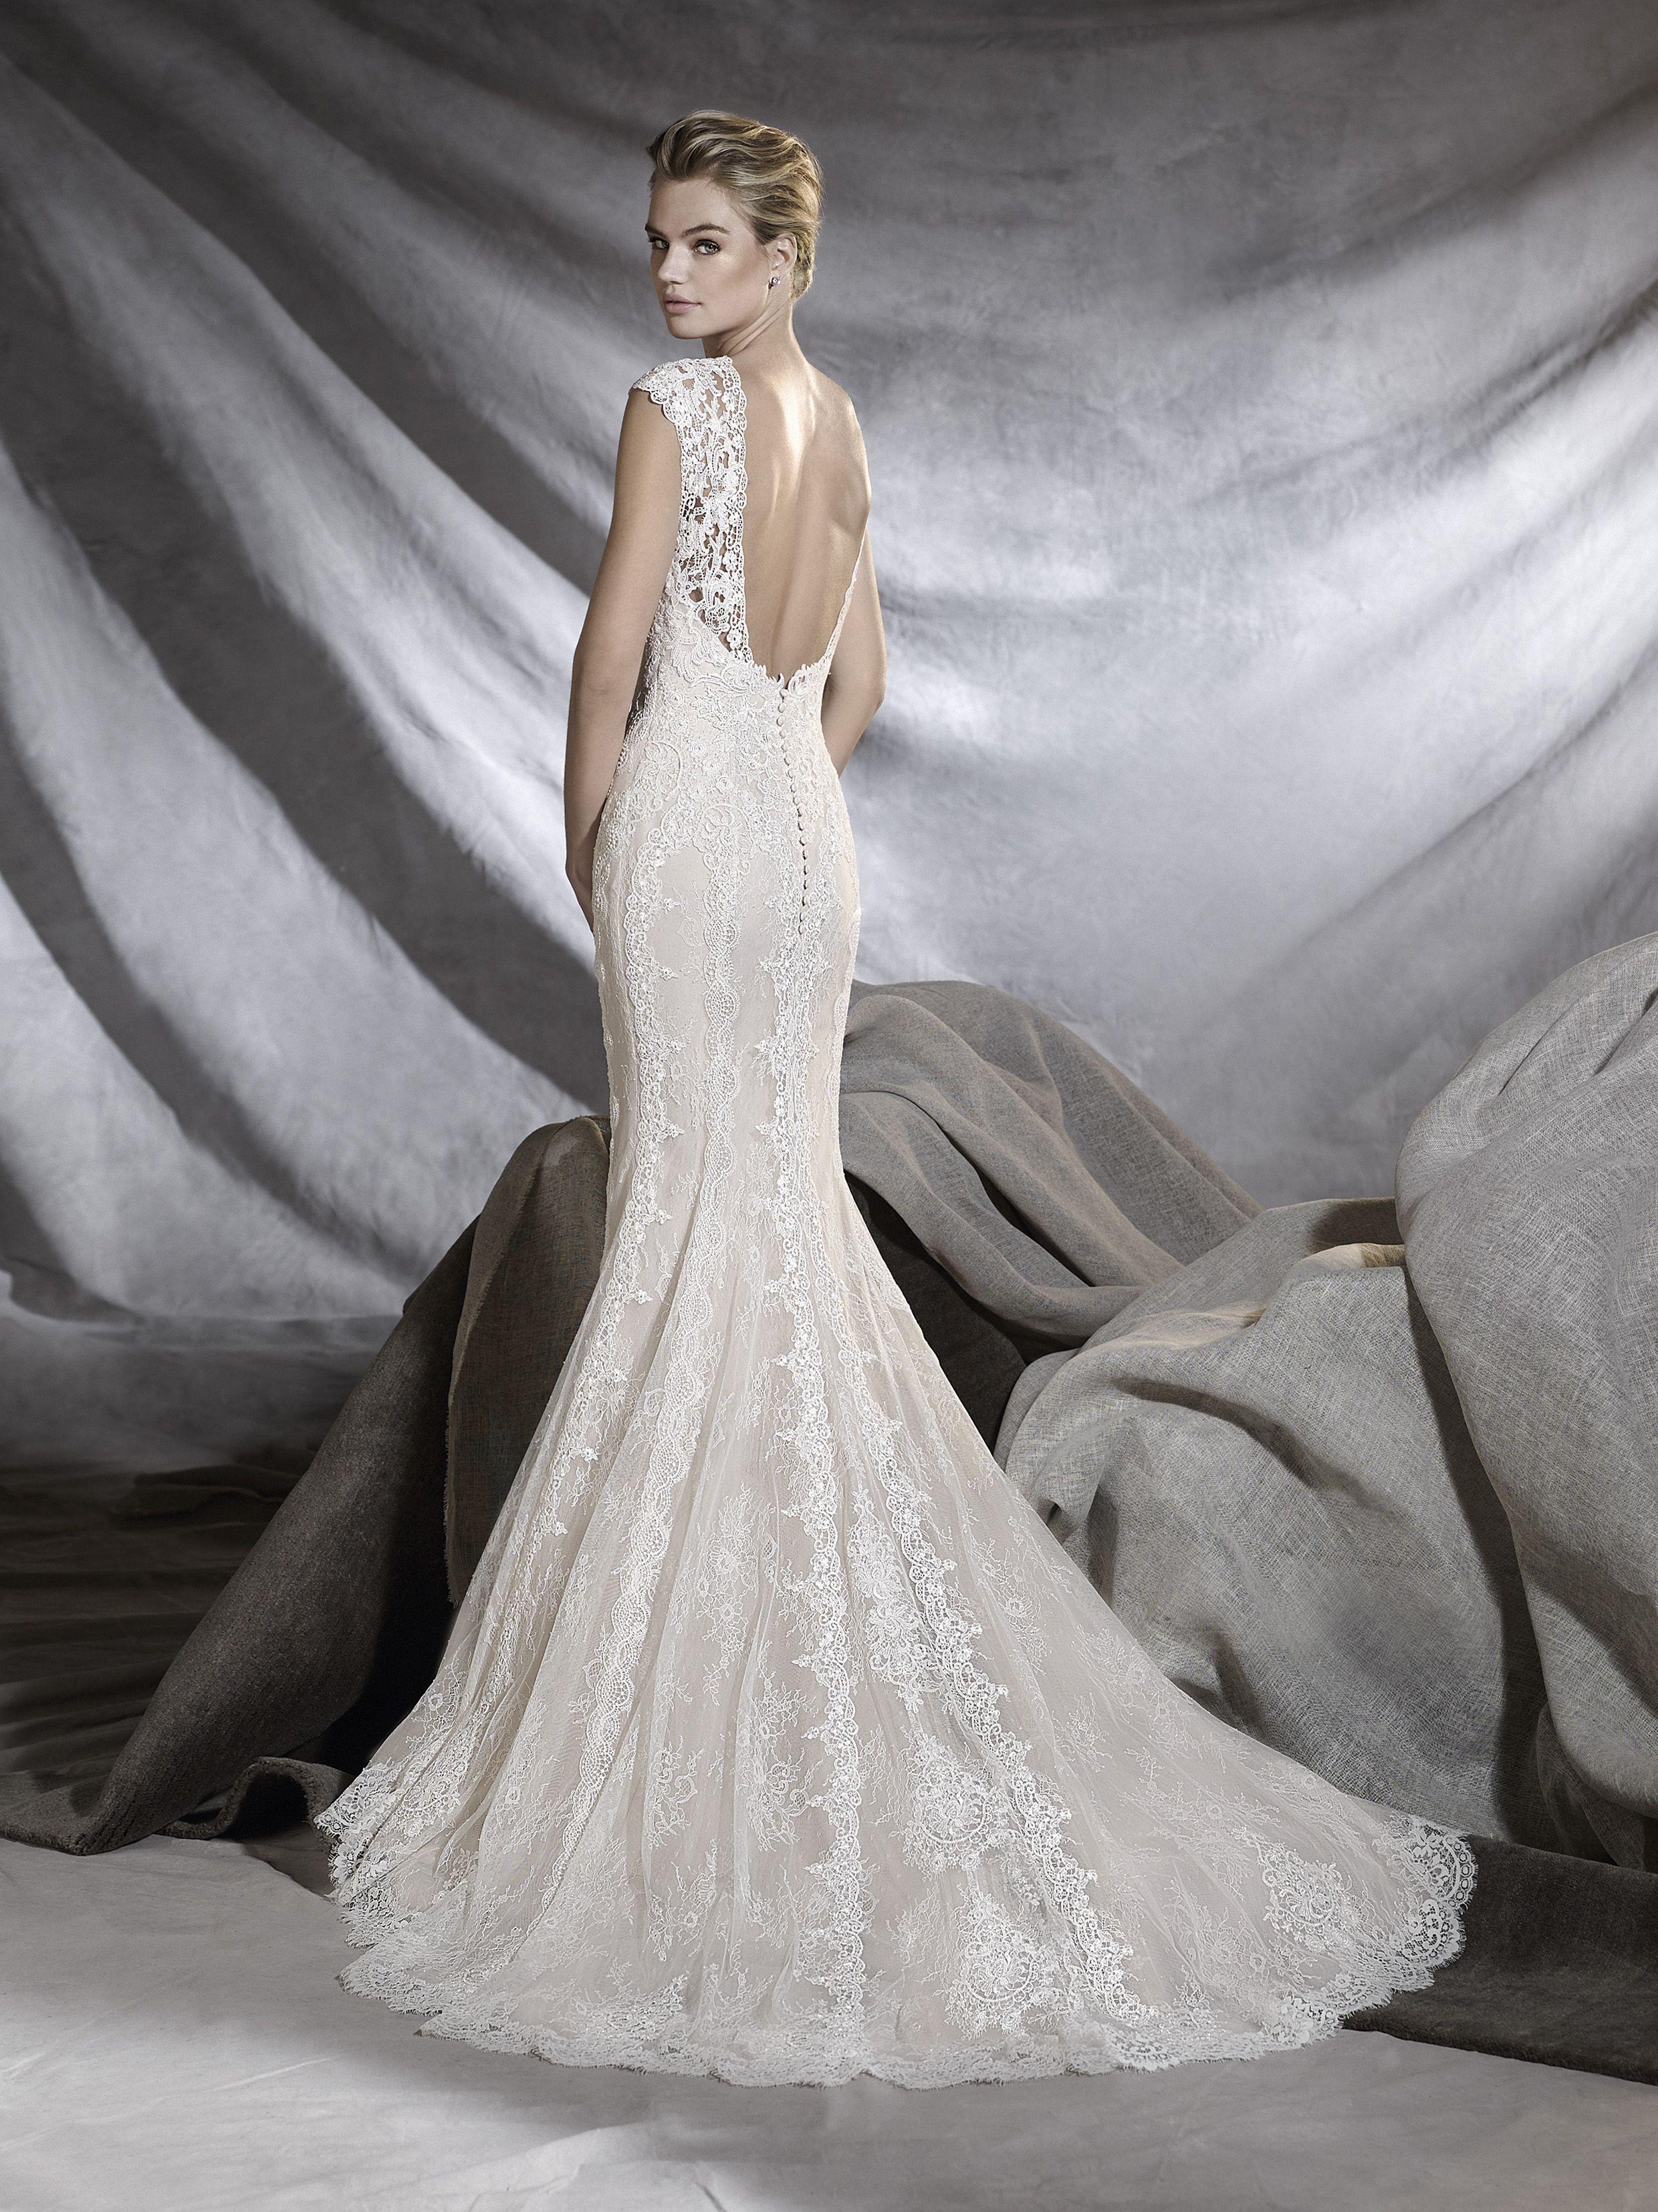 cc8b61be6e0d OSIRIS Wedding Dress Sample Sale, Wedding Dresses For Sale, Pronovias  Wedding Dress, Perfect